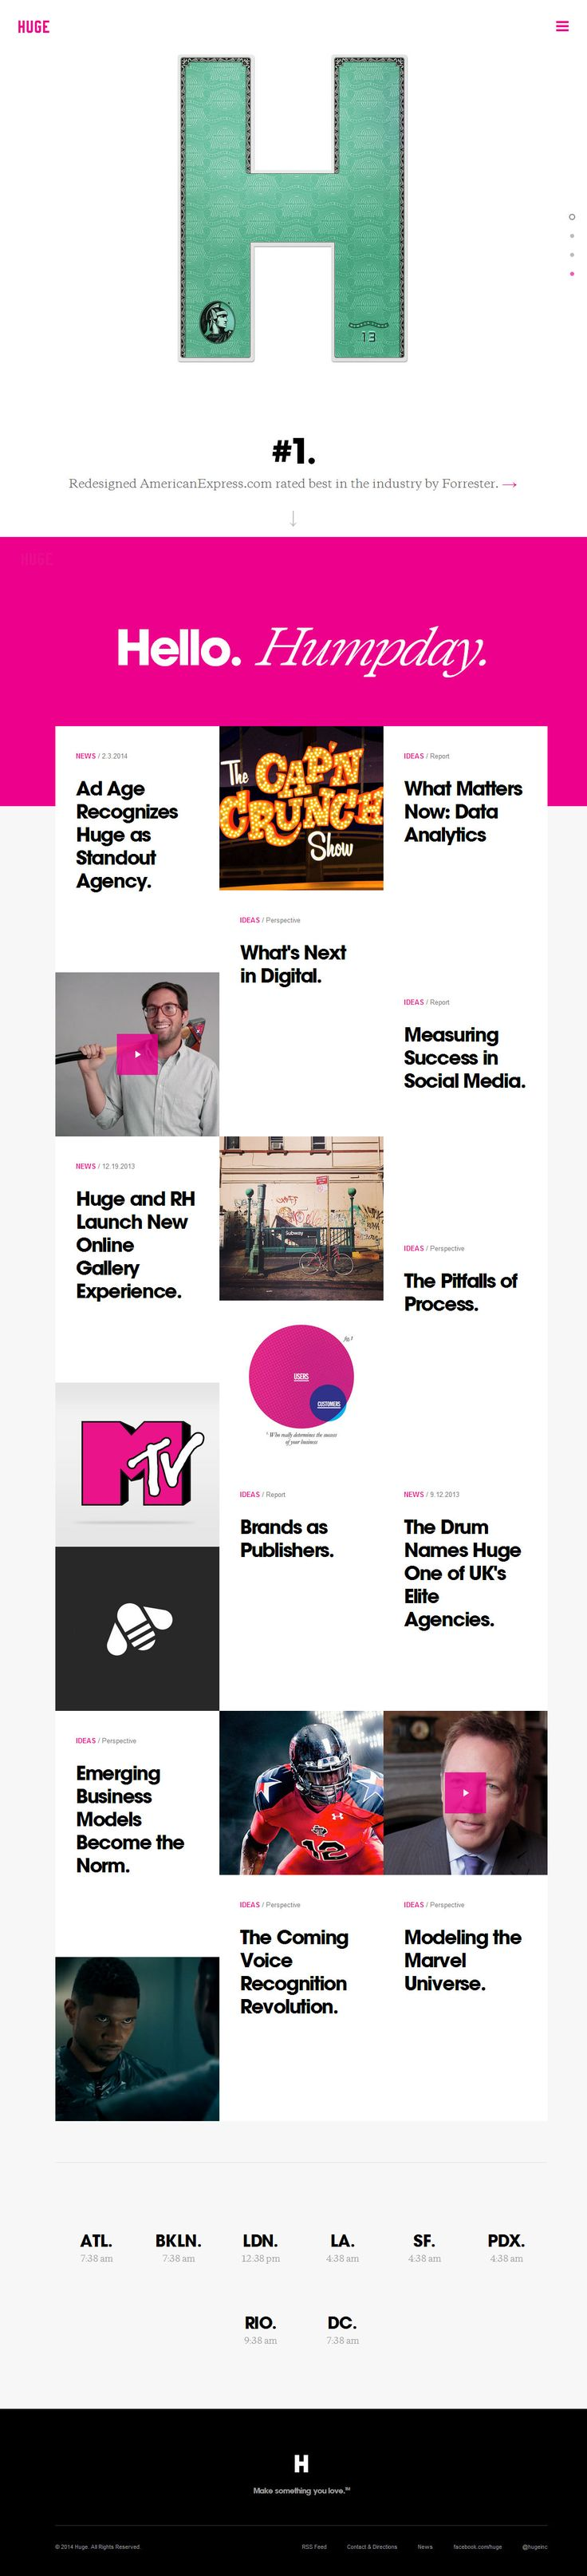 Site of the Month February 2014. ´Huge Inc.´ http://www.awwwards.com/web-design-awards/huge-inc